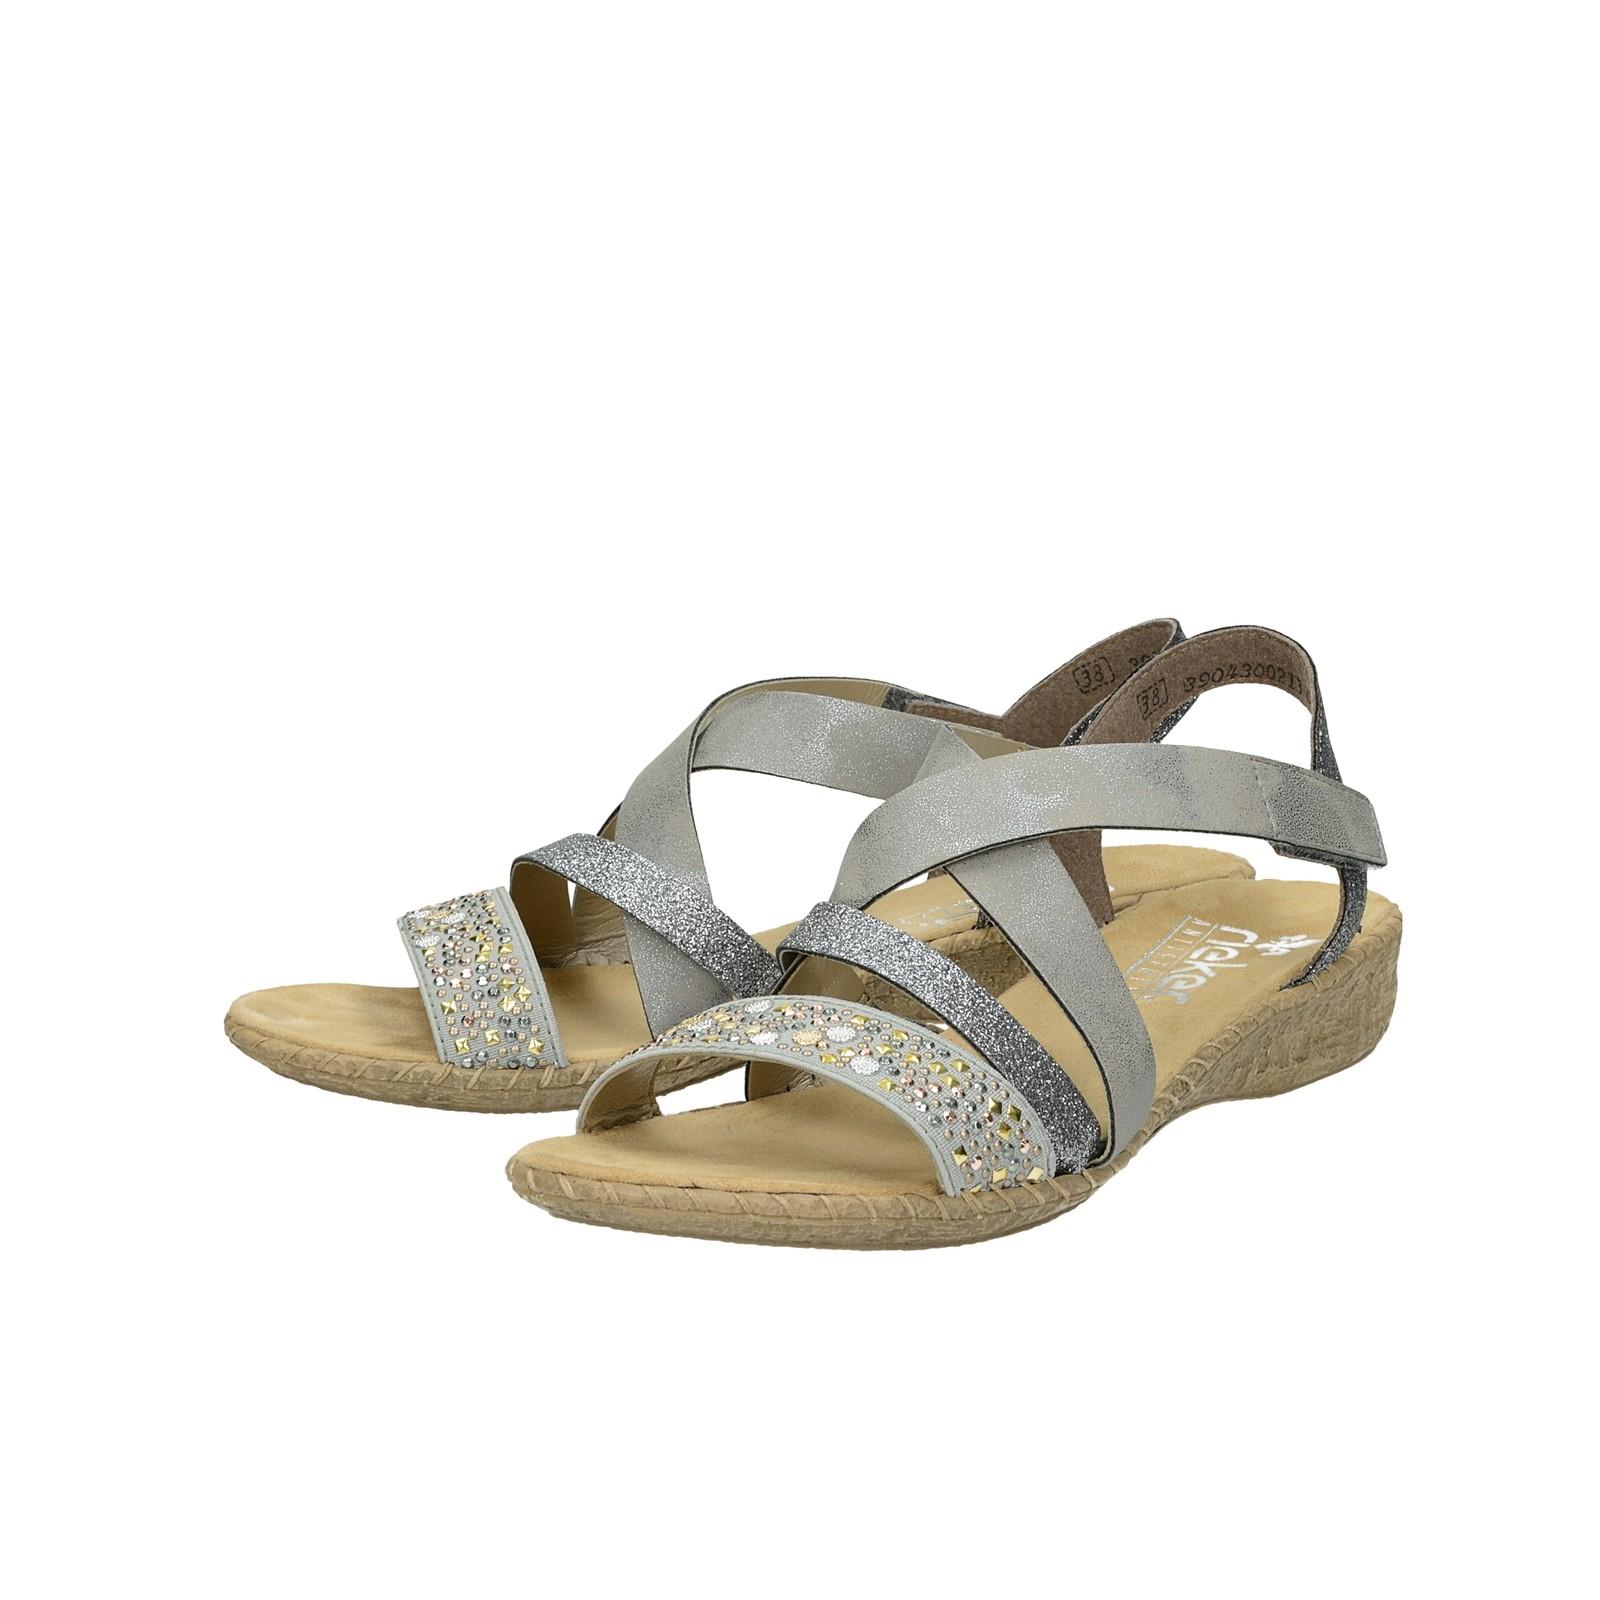 704897c0de1f Rieker dámske štýlové sandále s ozdobnými prvky - šedé ...